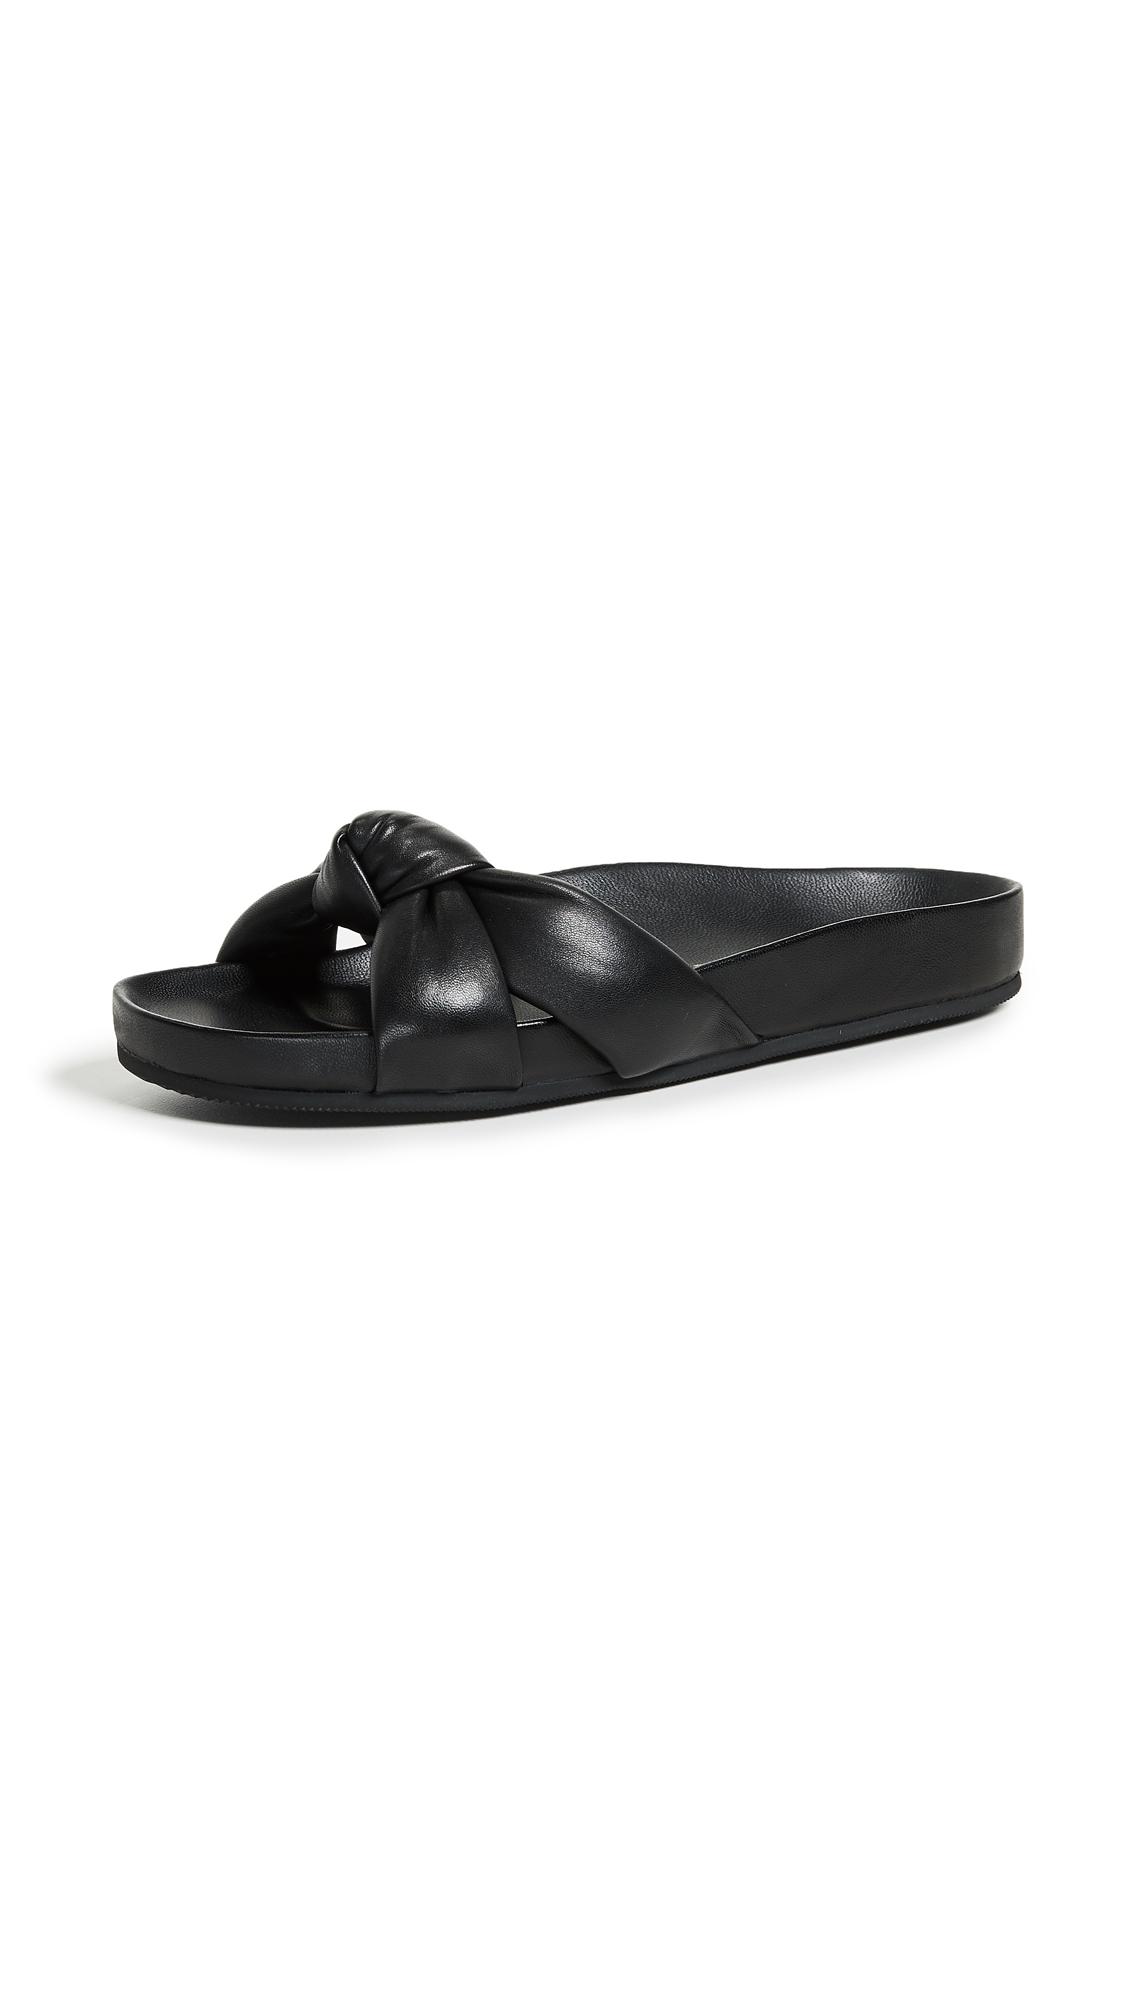 Loeffler Randall Gertie Knotted Slides - Black